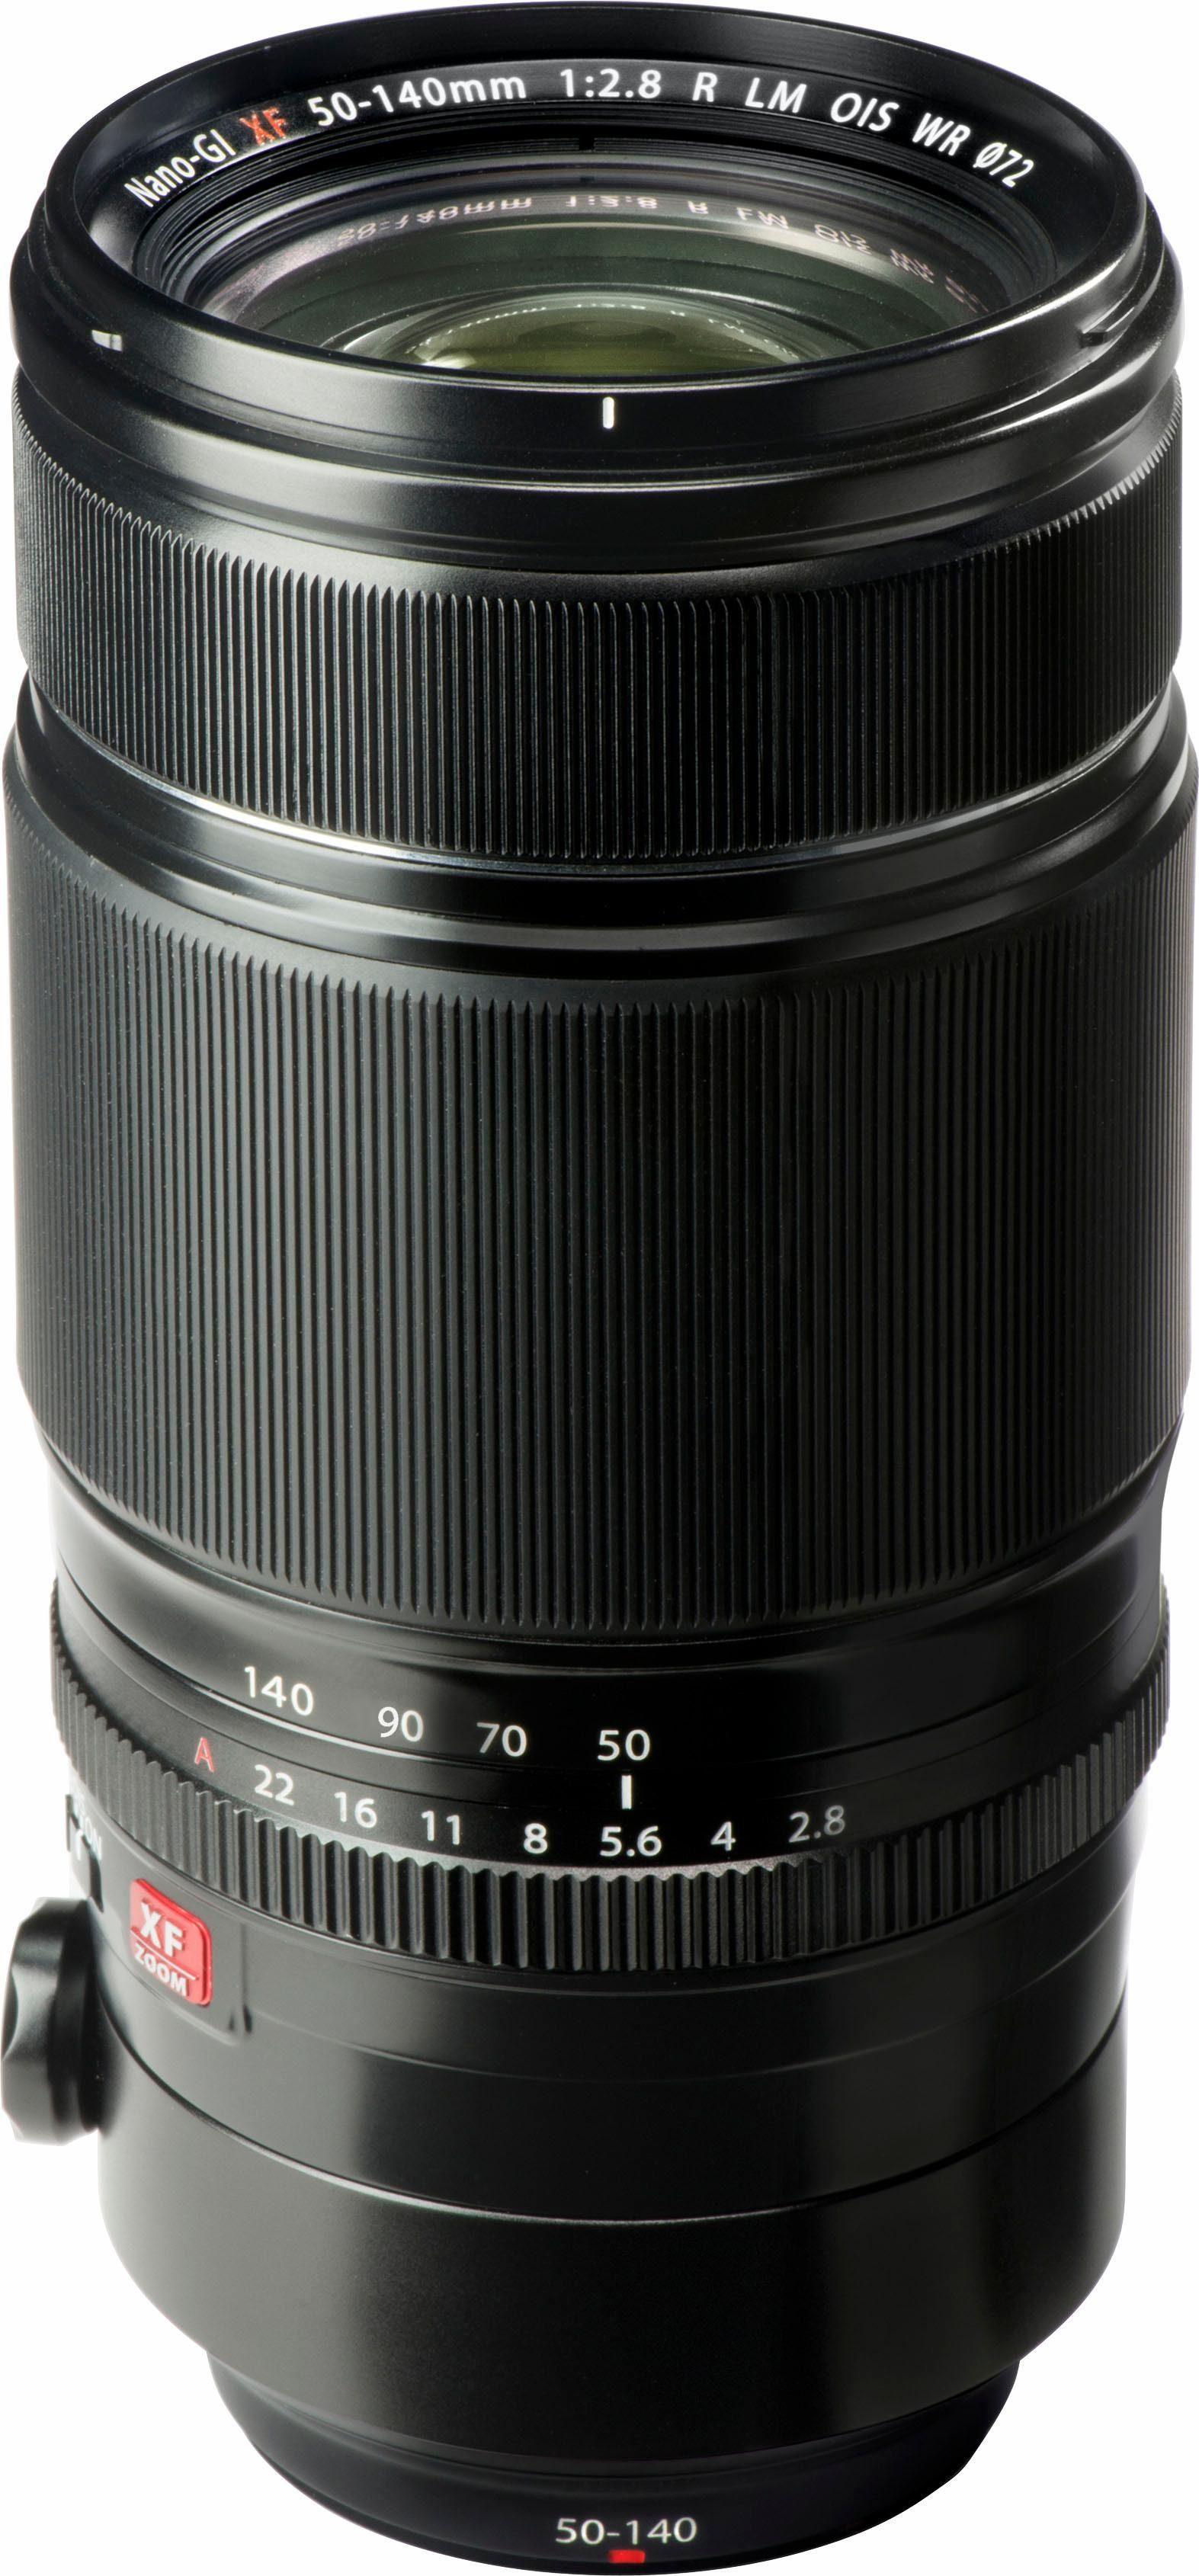 Fujifilm XF 50-140mm F2.8 R LM OIS WR Tele-Zoom-Objektiv